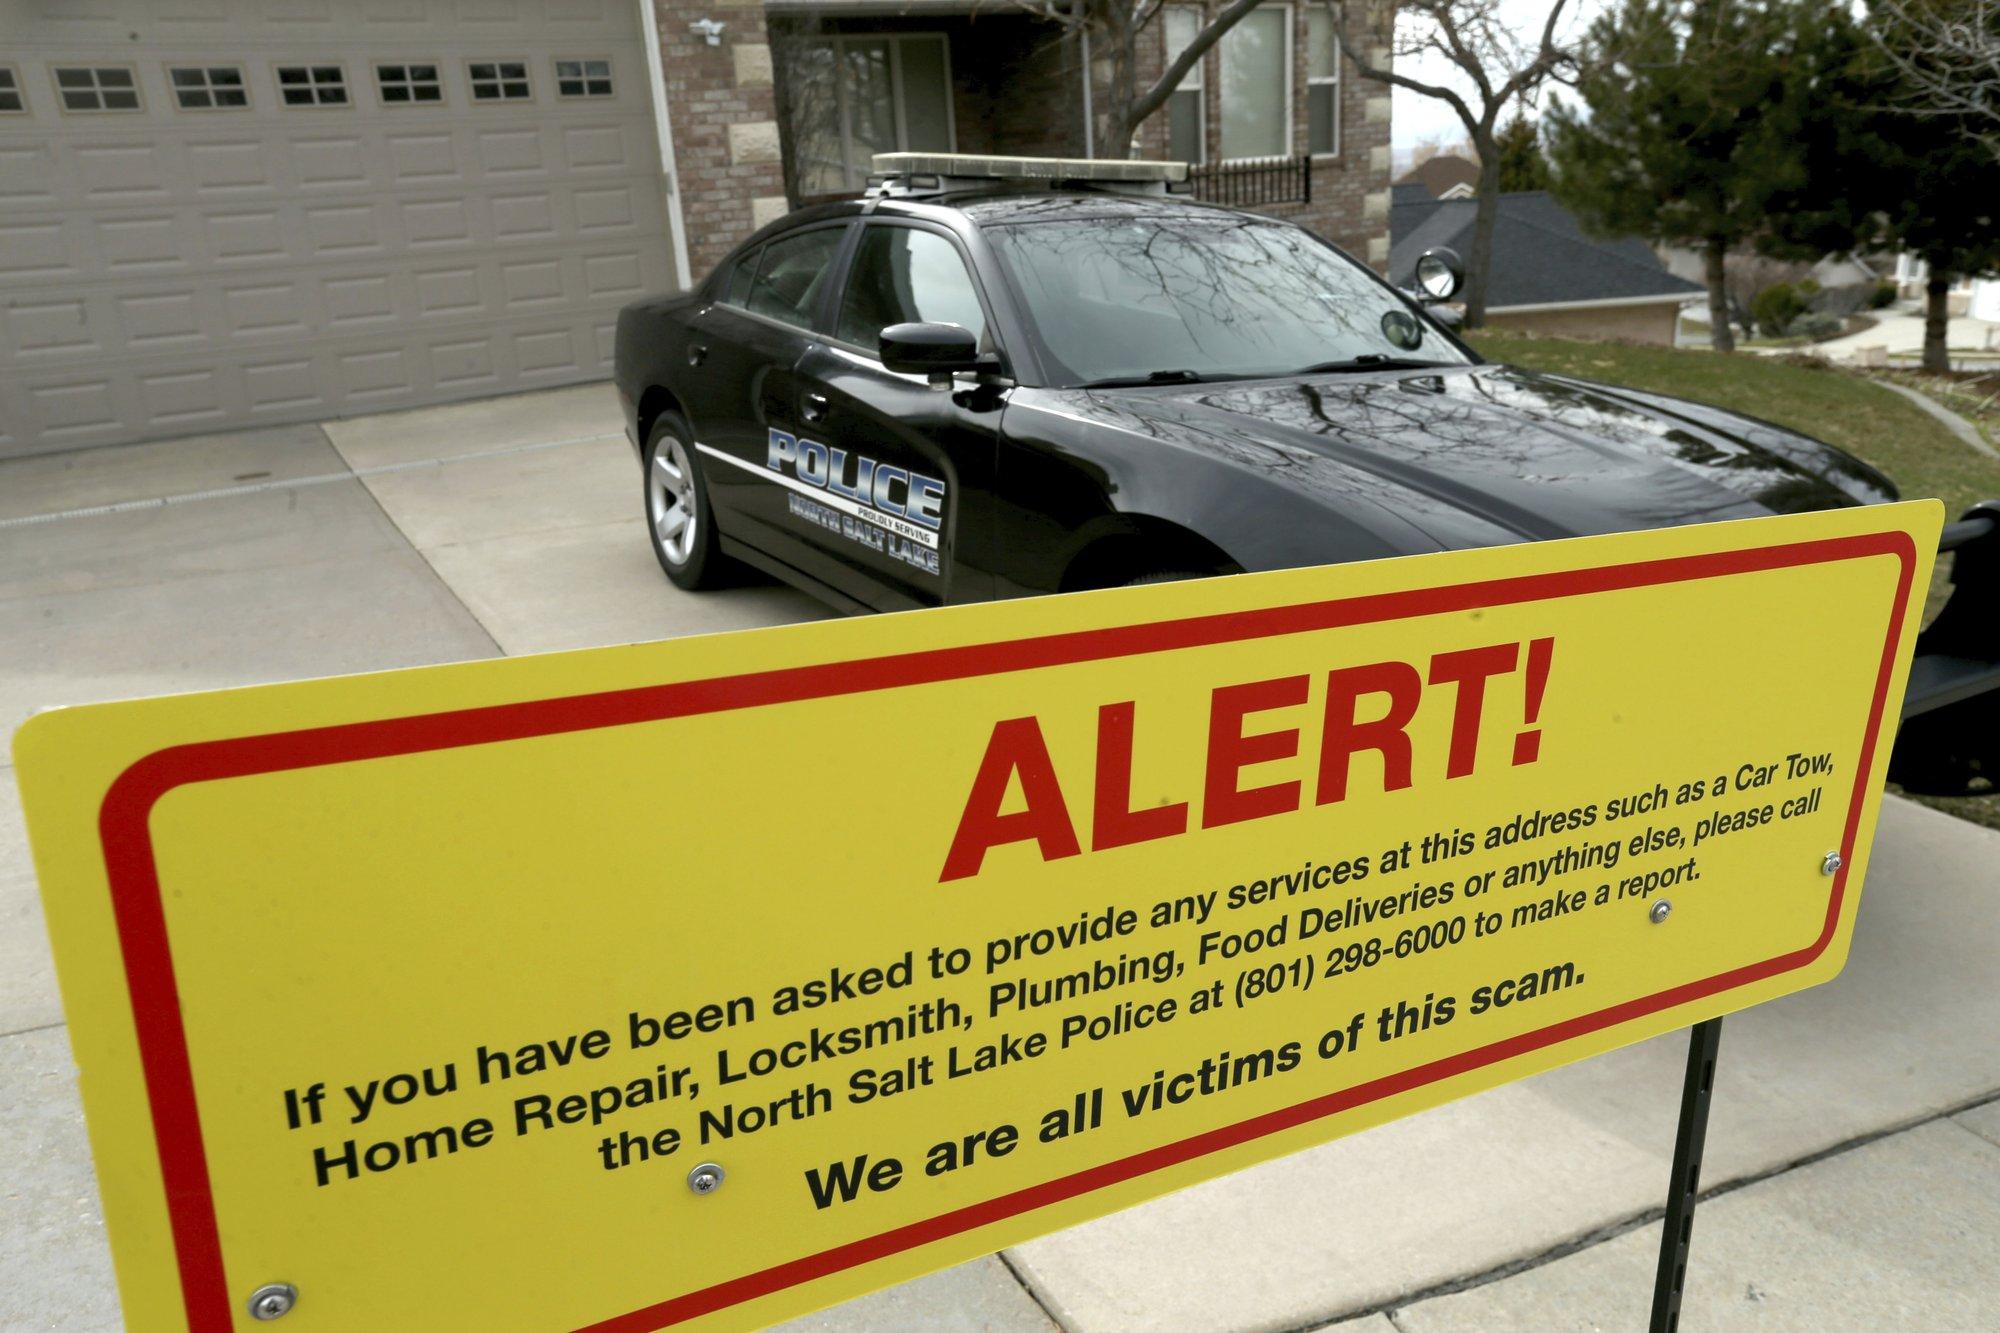 An 'extreme stalker' has a Utah family's home under siege_1553562151830.jpeg.jpg